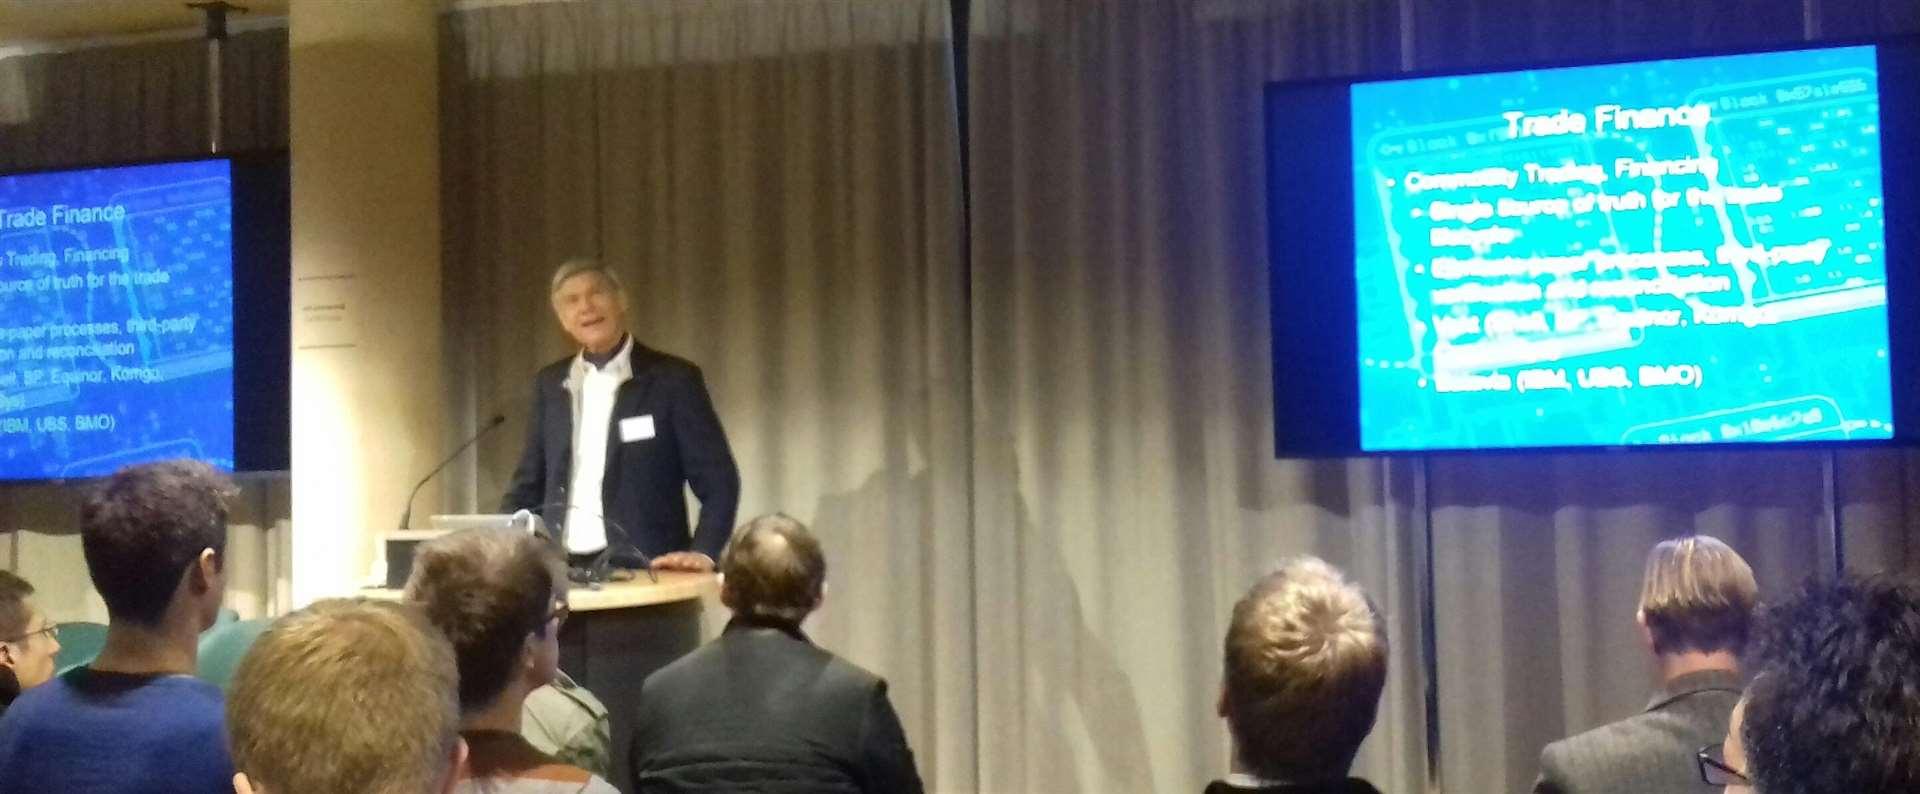 Dr Hermann Hauser at the Blockchain Forum in Cambridge (5692583)